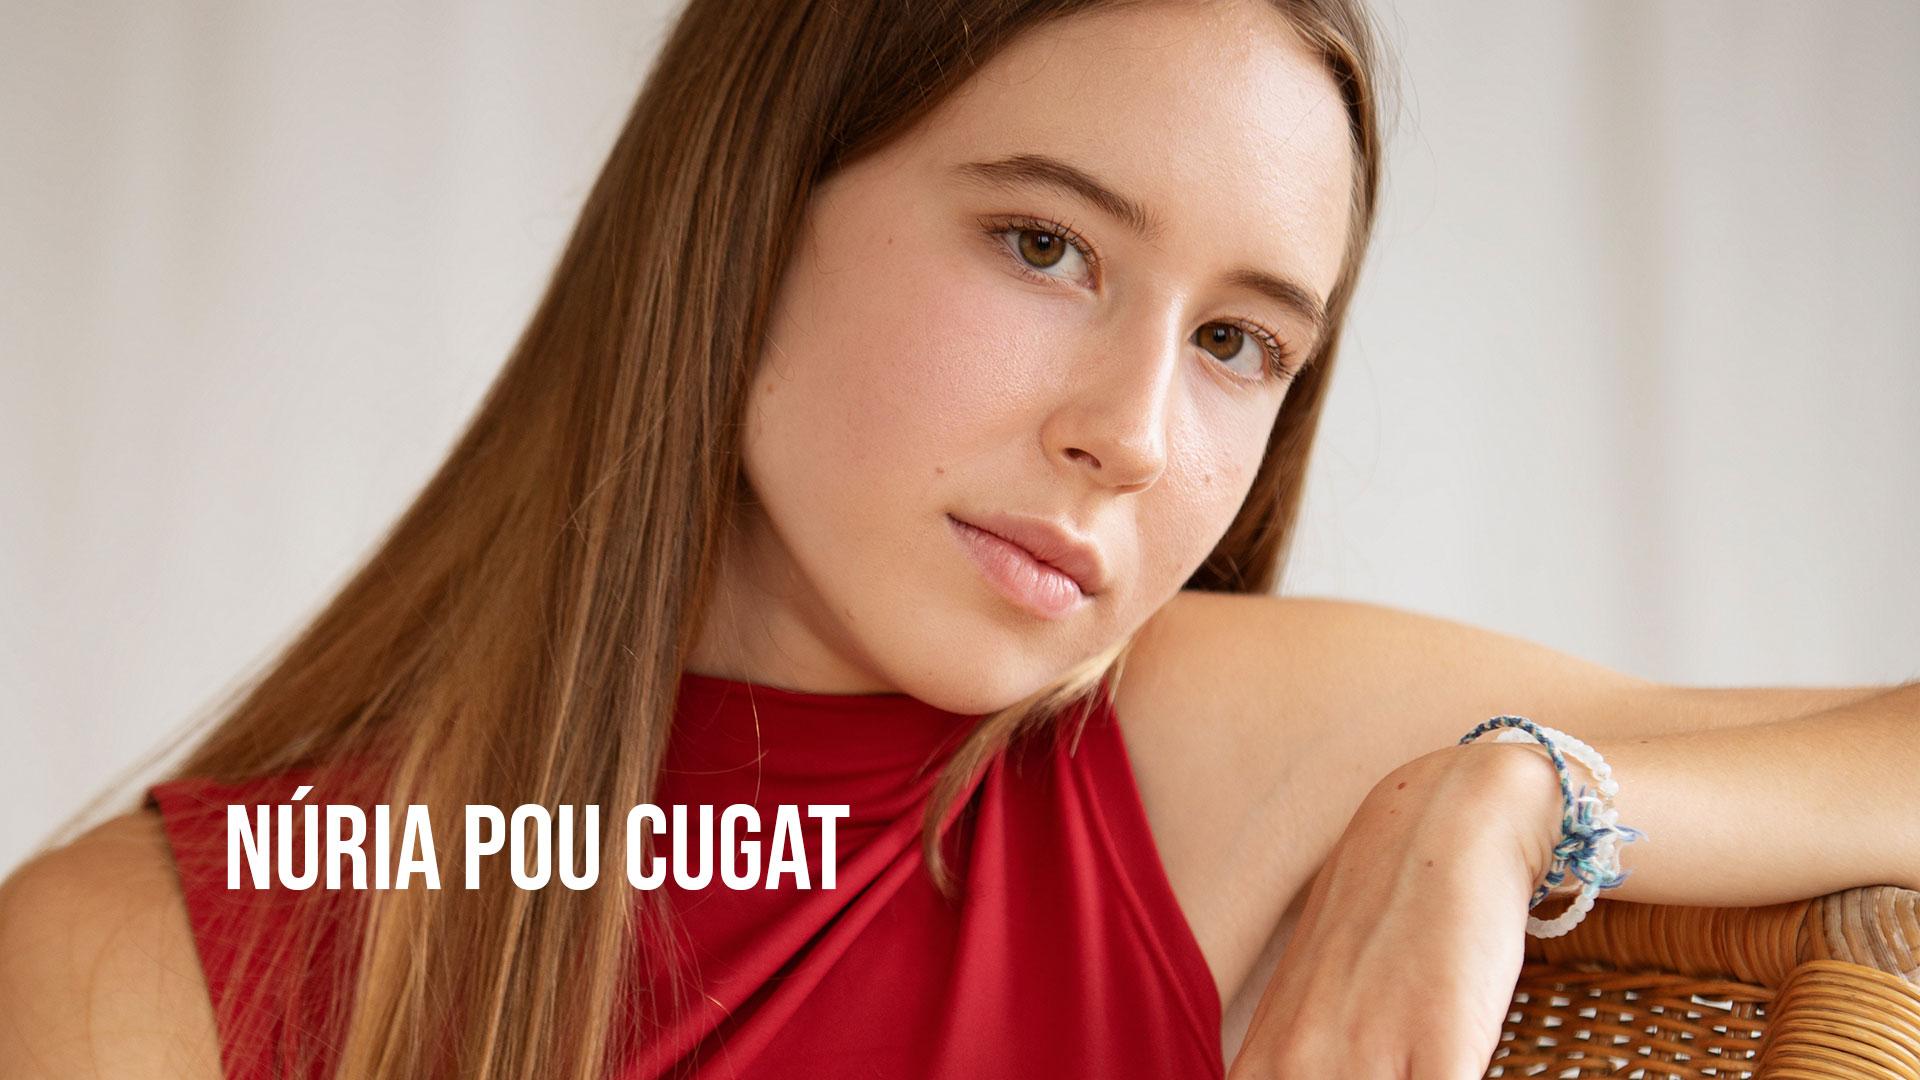 Núria Pou Cugat | Videobook Actriz